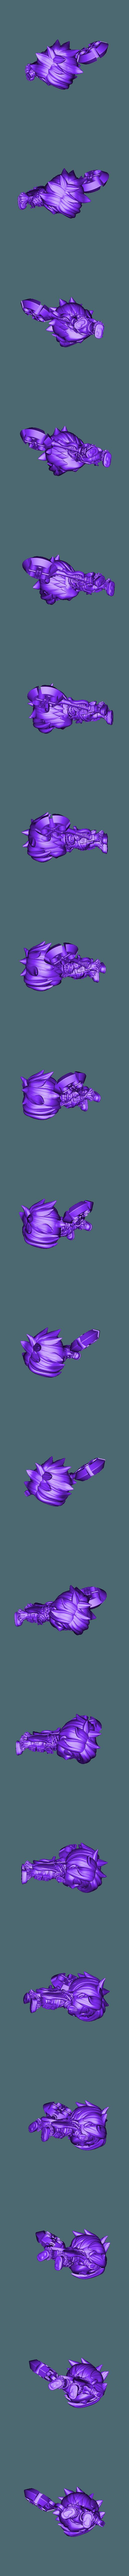 Creator_Takoyaki.stl Télécharger fichier STL gratuit Chibi Creator Takoyaki - Ragnarok Online Fan Art • Objet à imprimer en 3D, HyperMiniatures